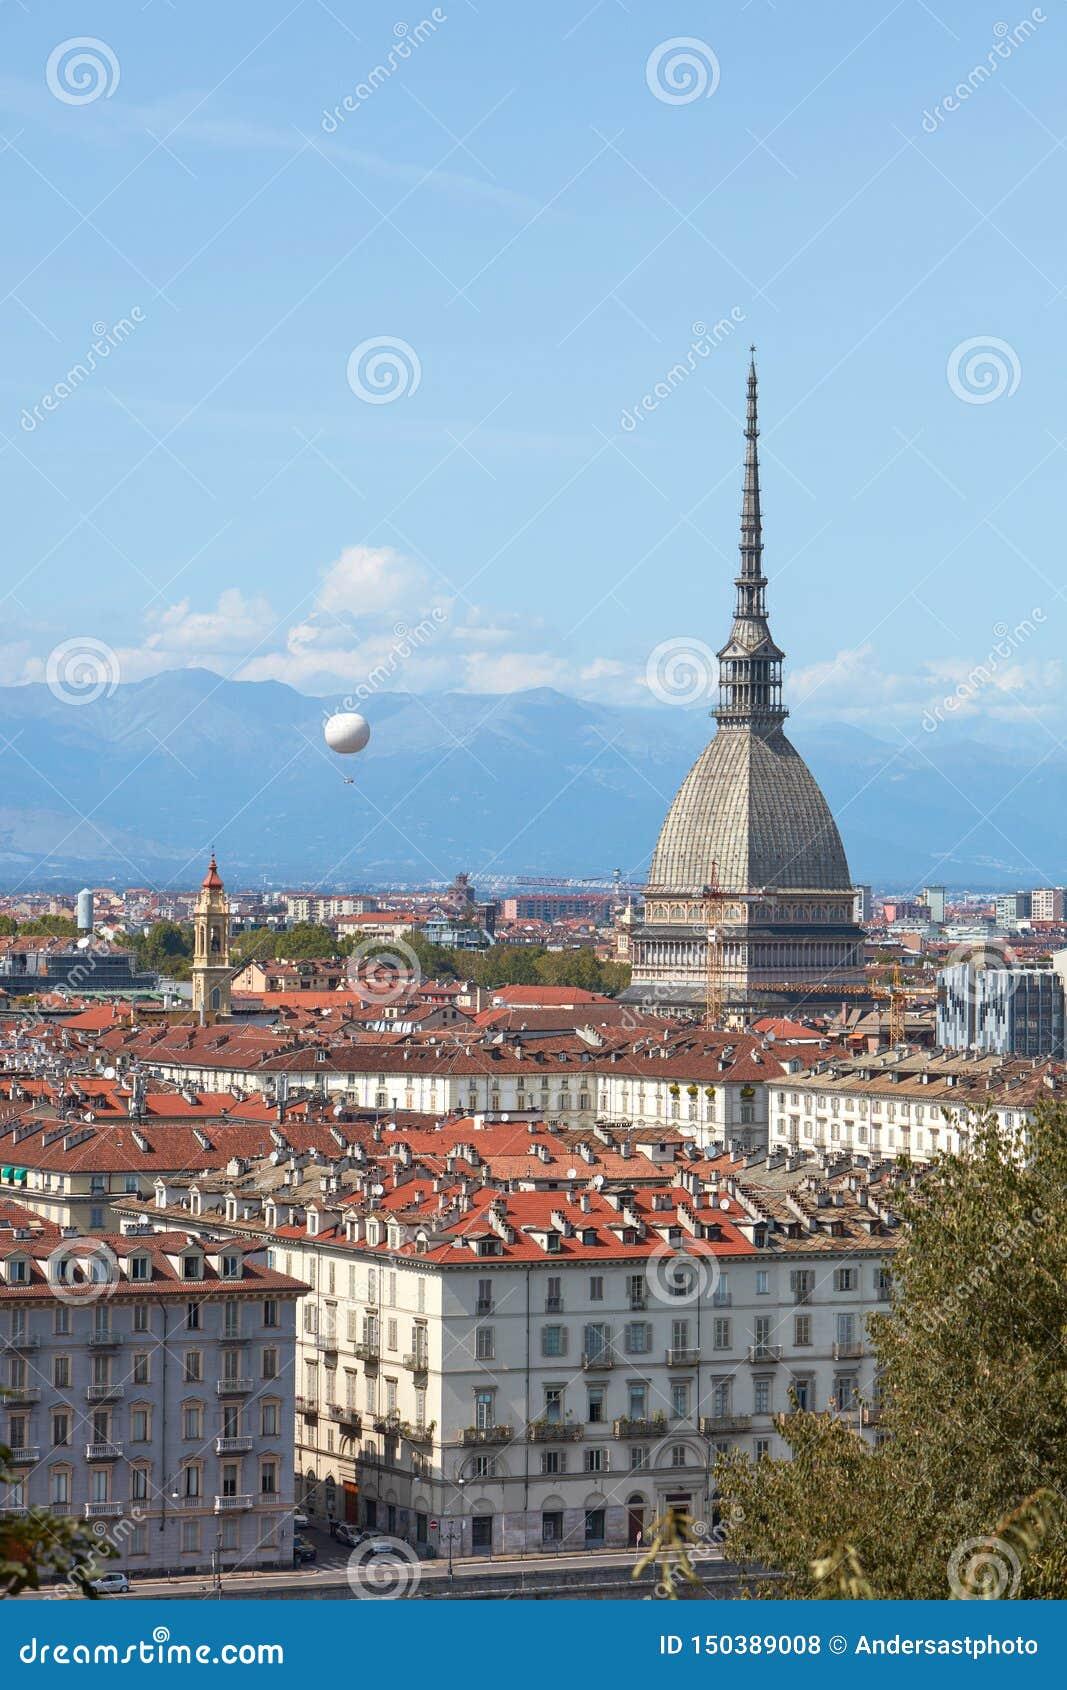 Mole Antonelliana Tower And Hot Air Balloon Over Turin ...